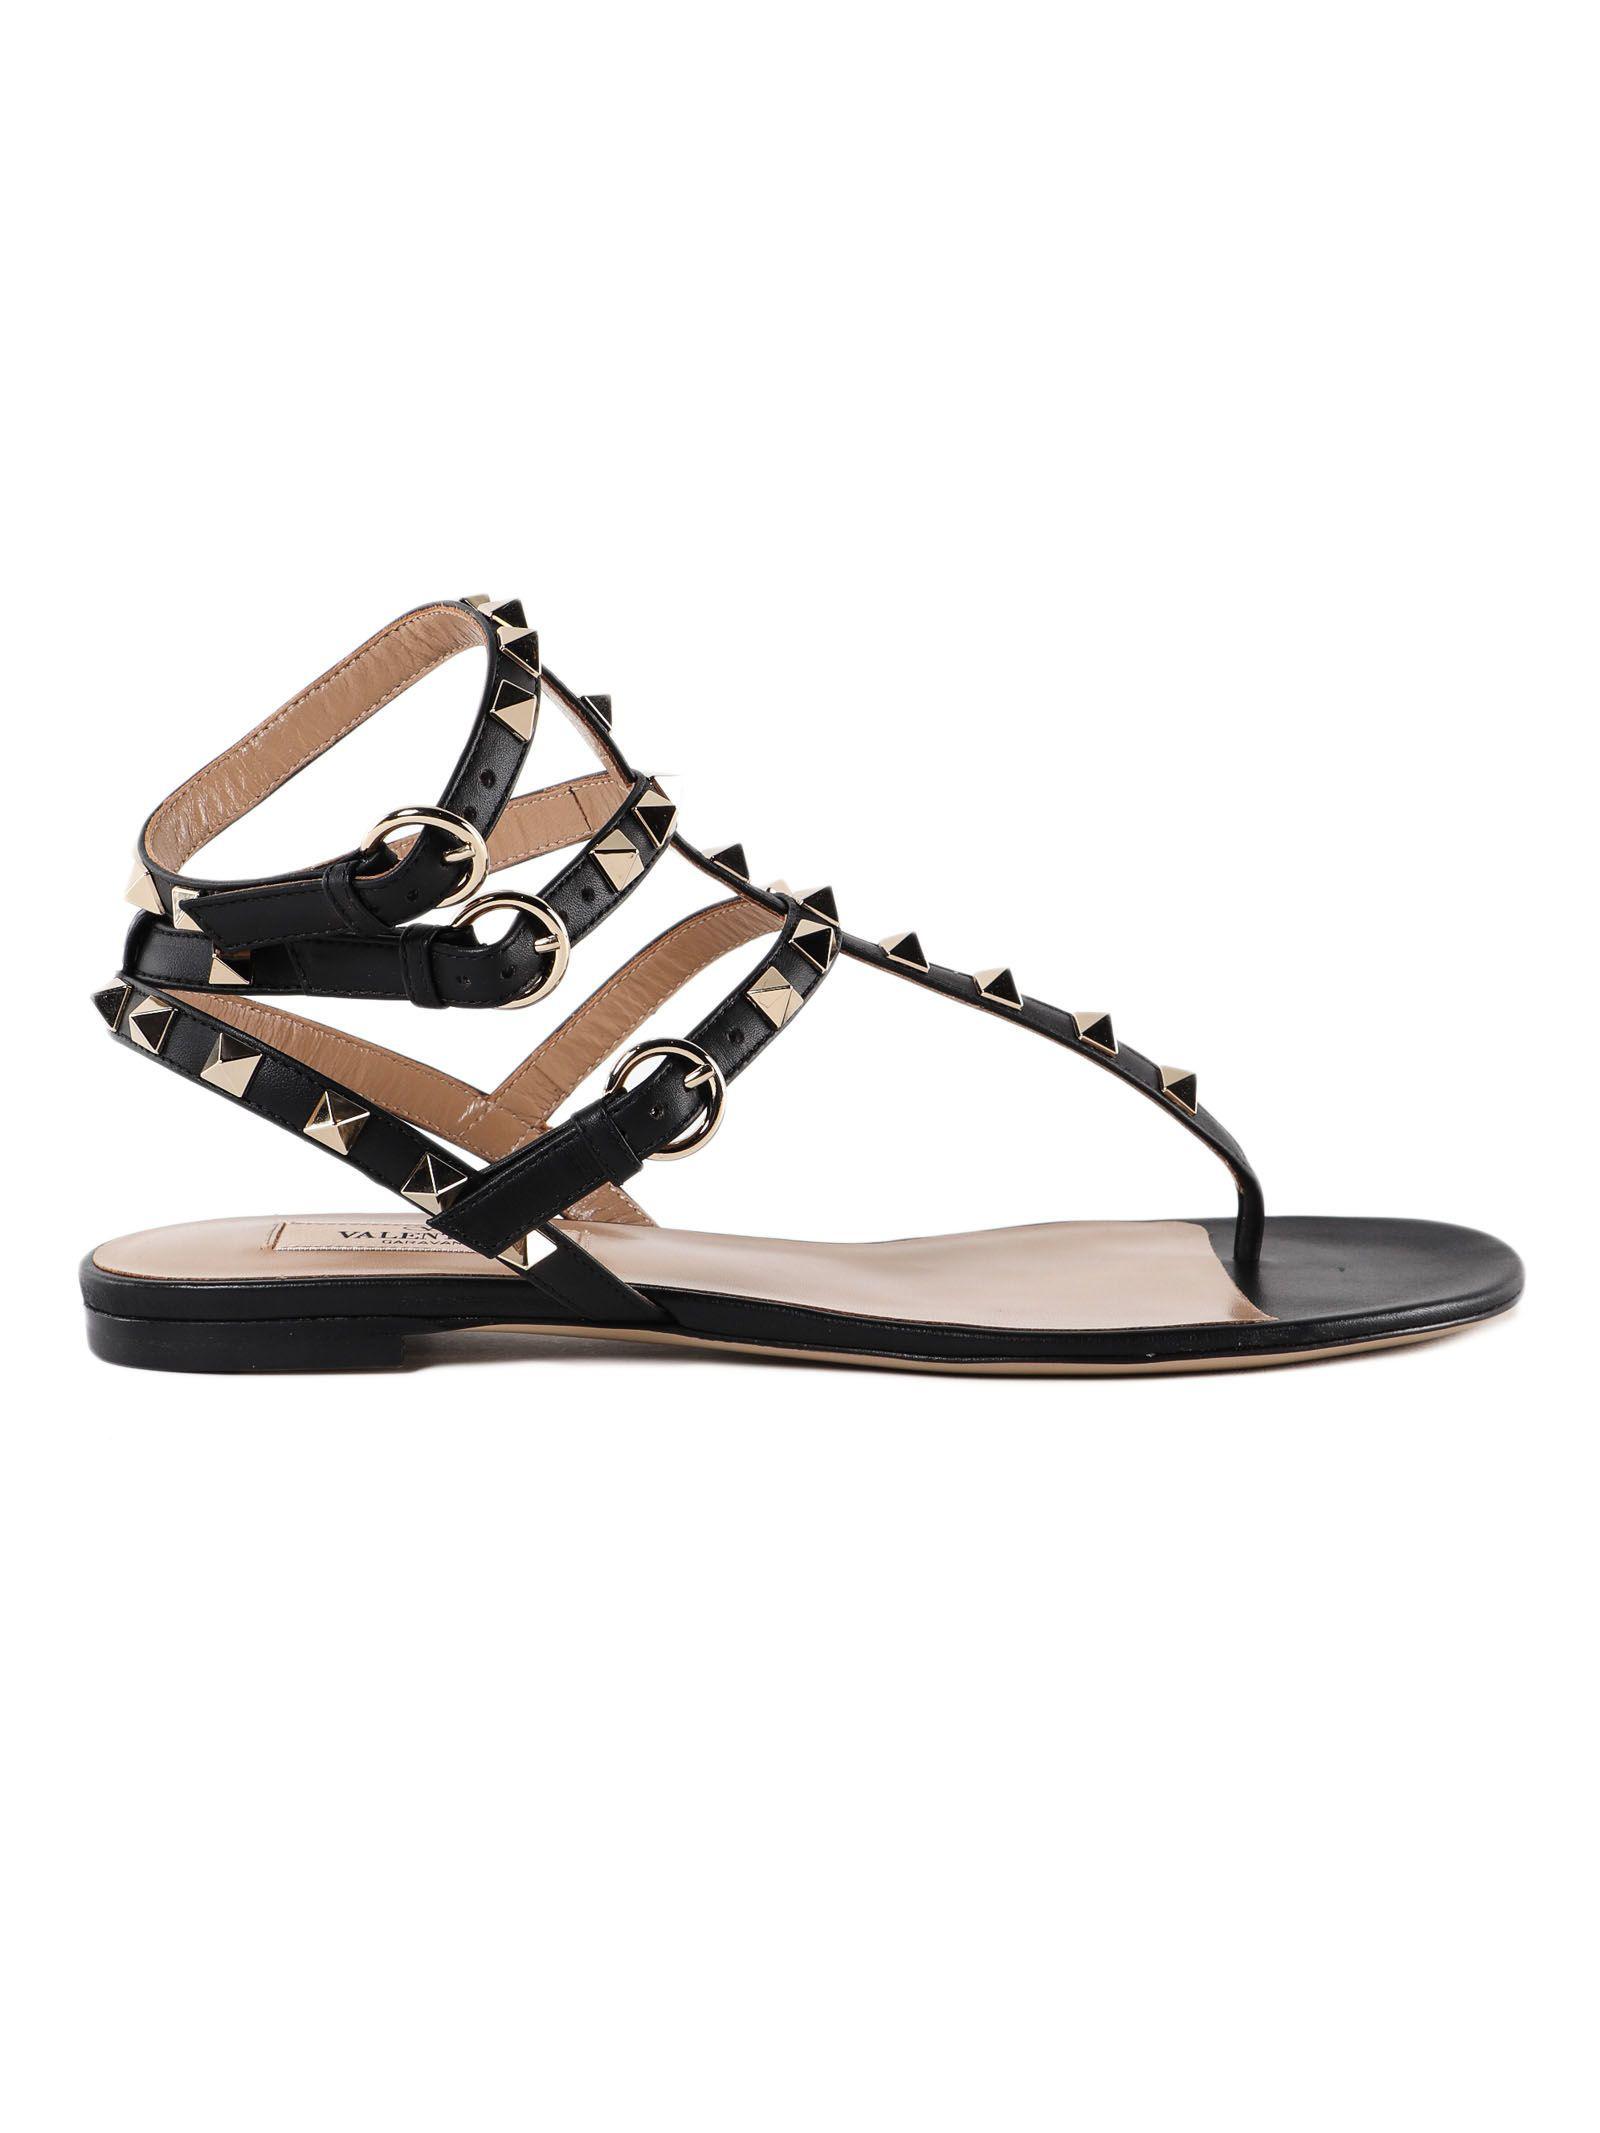 490dd2910b08 Valentino Rockstud Ankle-Wrap Flat Thong Sandals